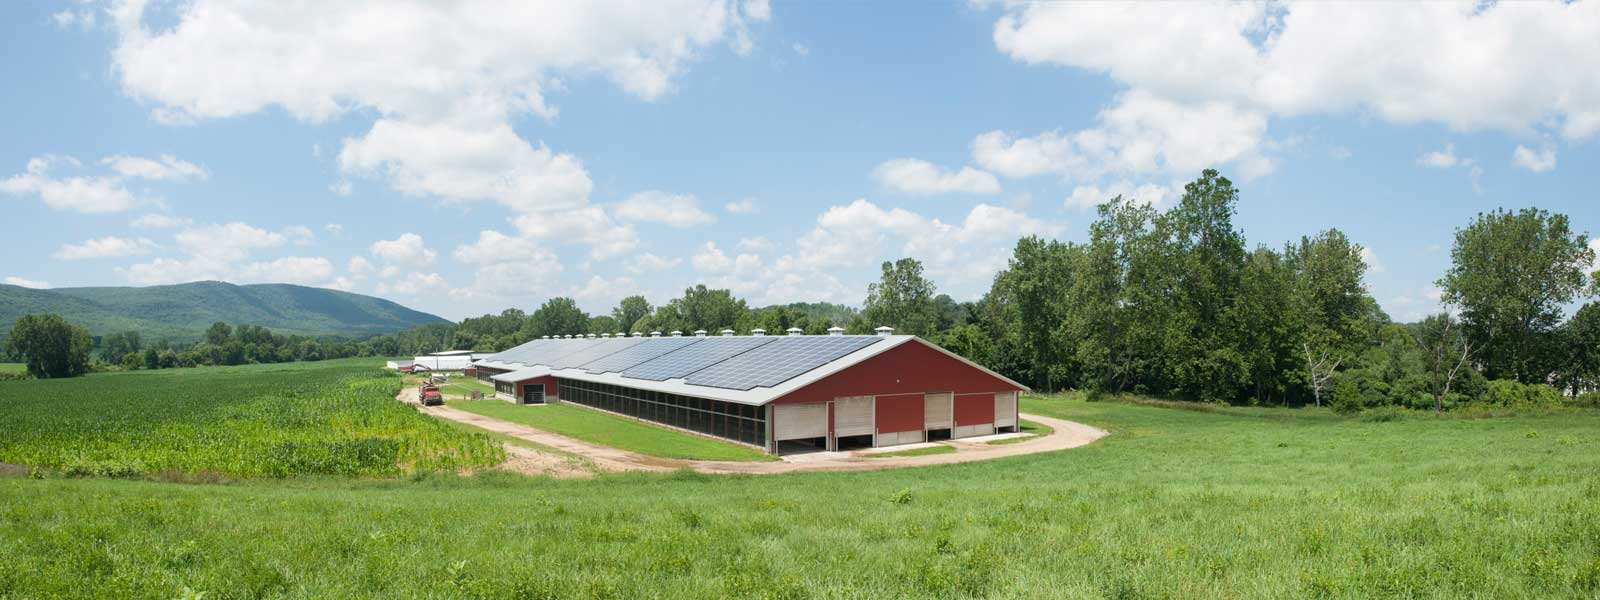 Freund's Farm